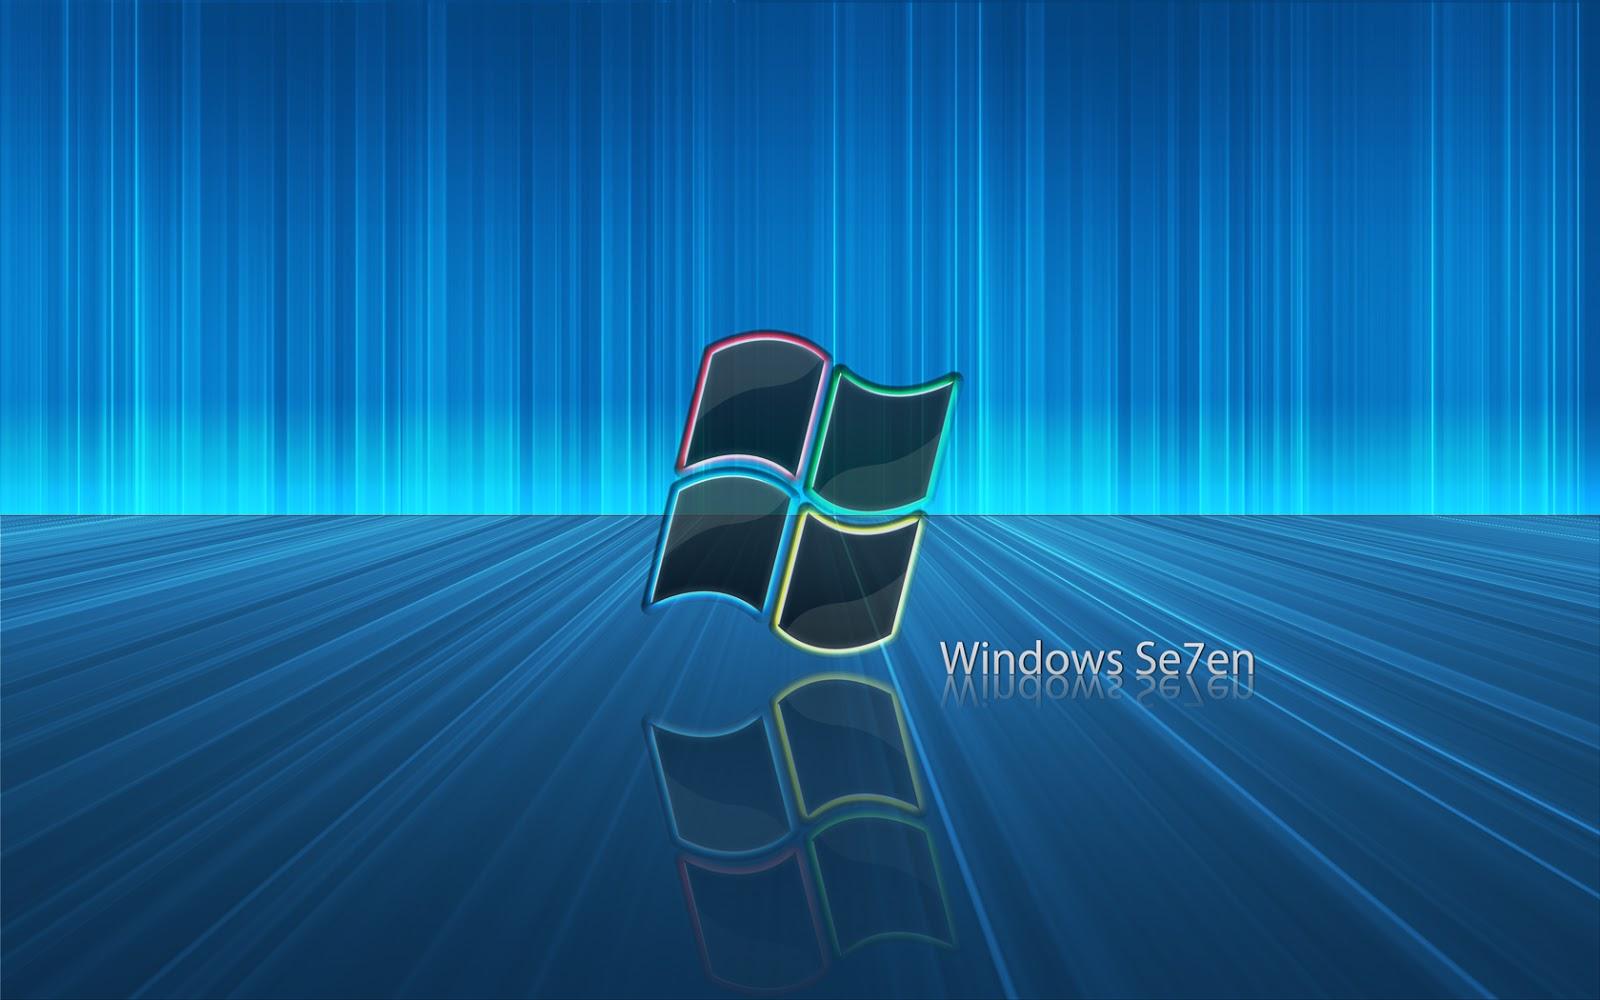 desktop backgrounds for windows 7 hd (53 wallpapers) – adorable